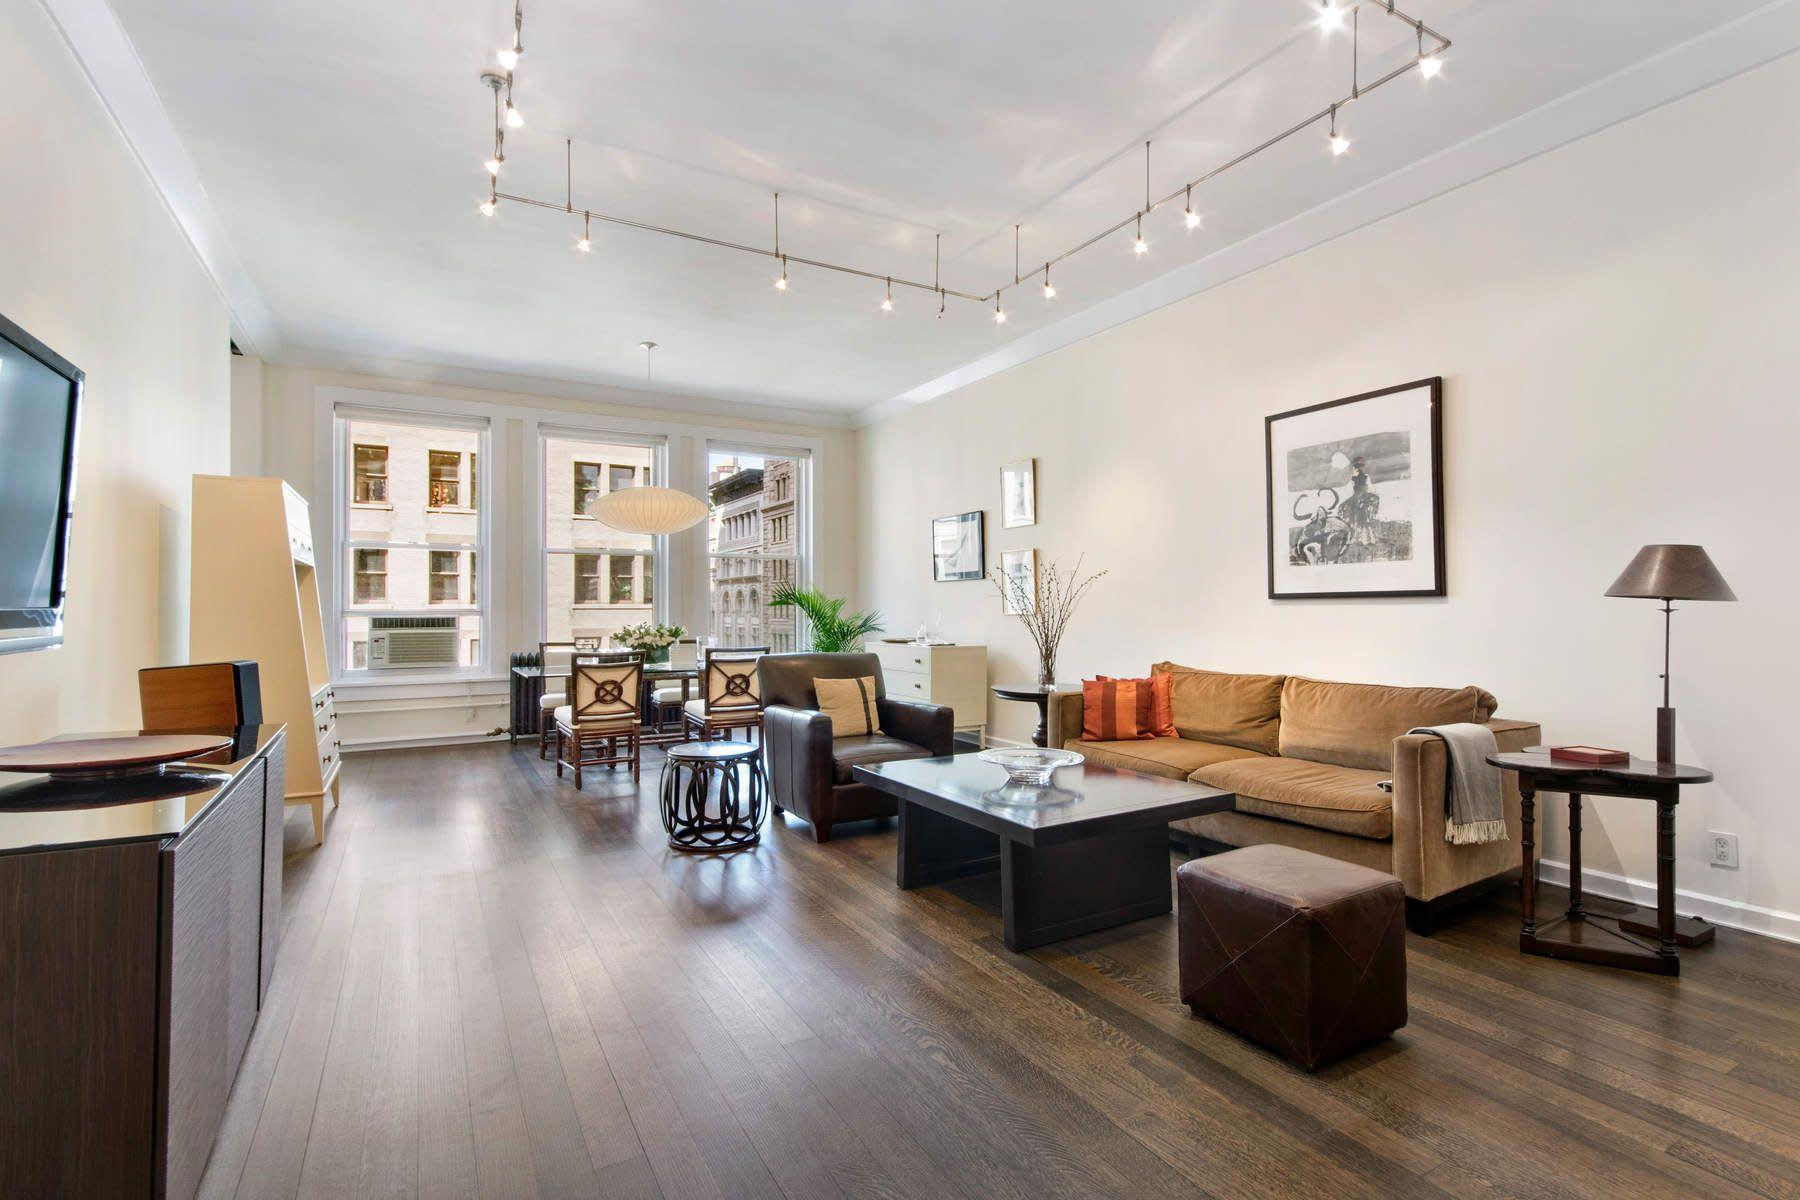 105 Fifth Avenue, Apt 6A